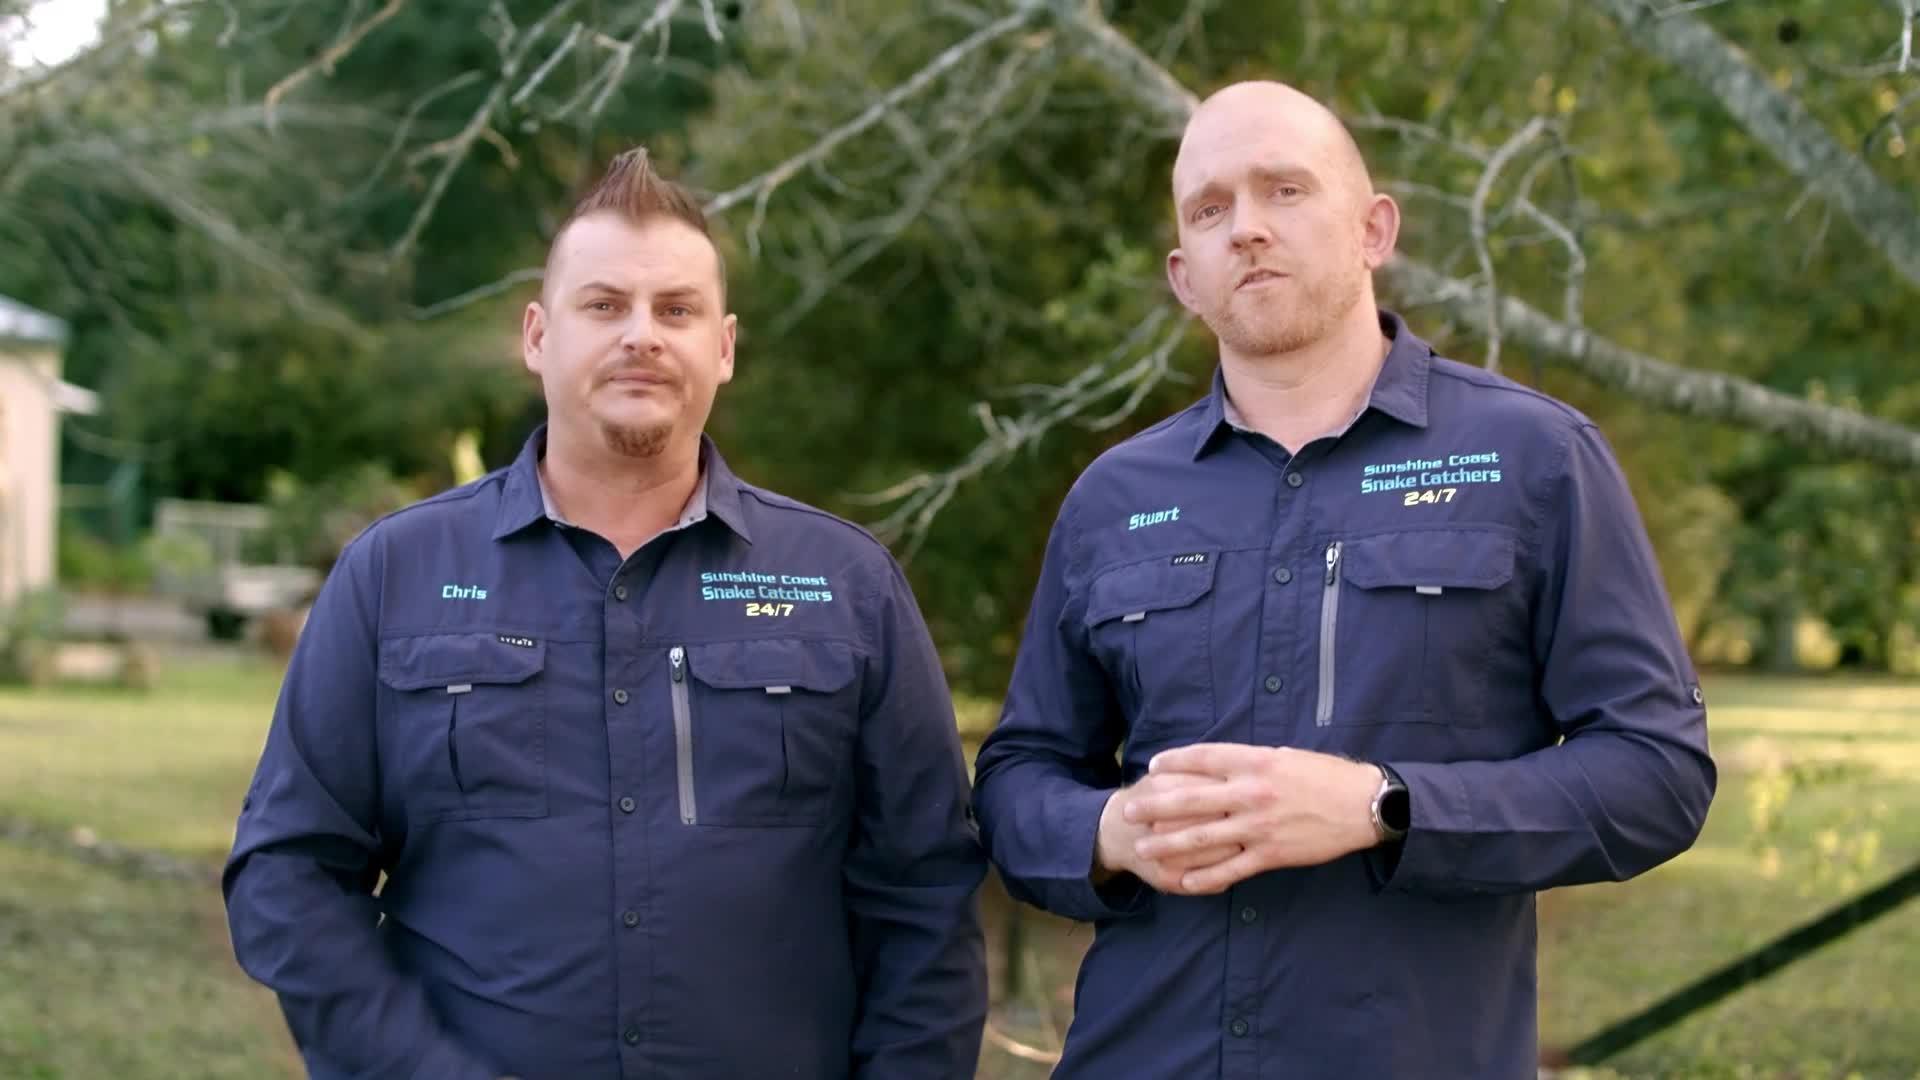 Snake Safety 2 | Aussie Snake Wranglers | National Geographic Australia & New Zealand